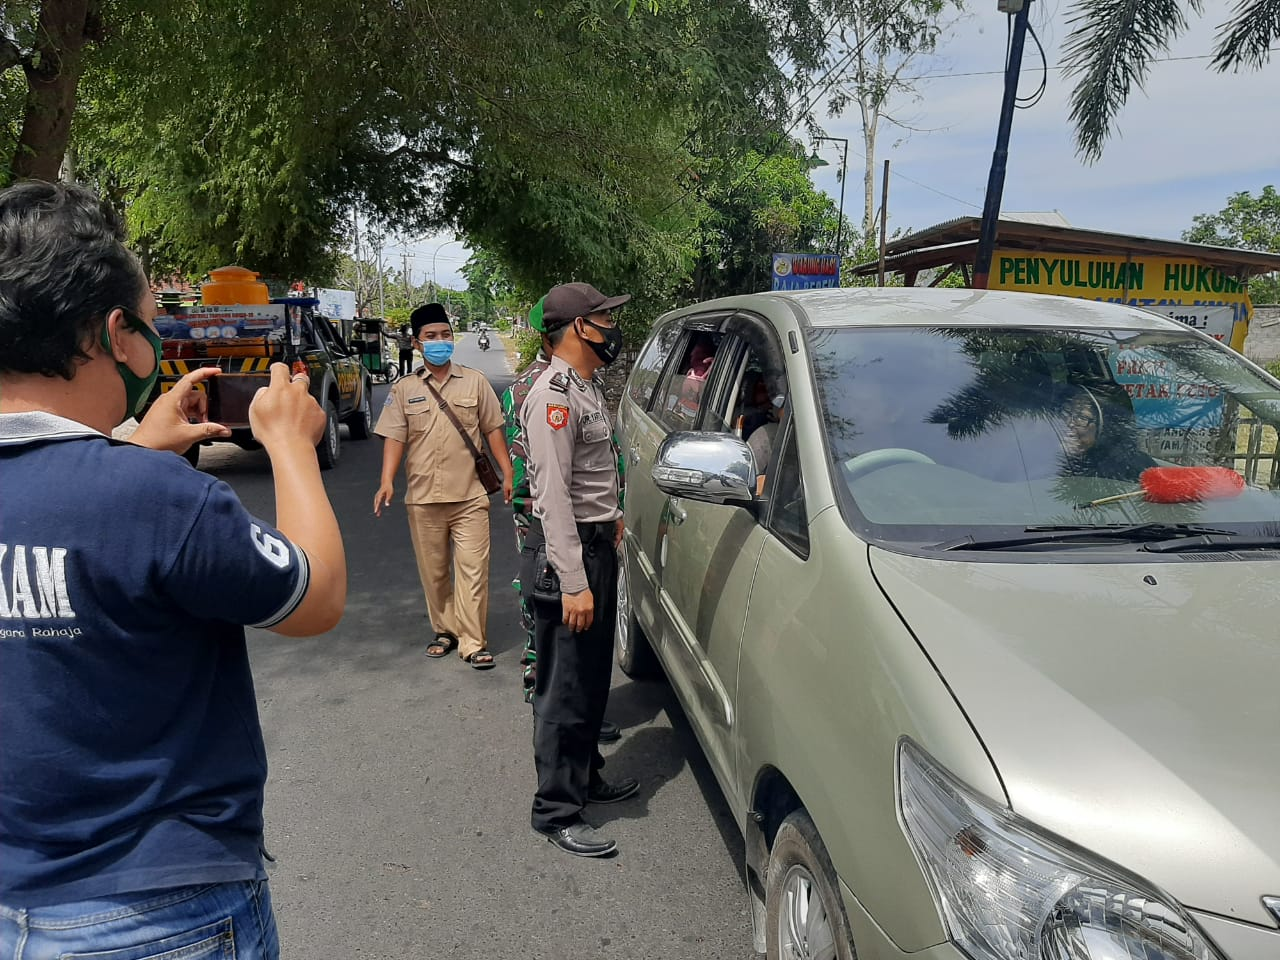 Laksanakan Operasi Yustisi, Anggota Polsek Kwanyar Polres Bangkalan Beri Teguran Kepada Warga